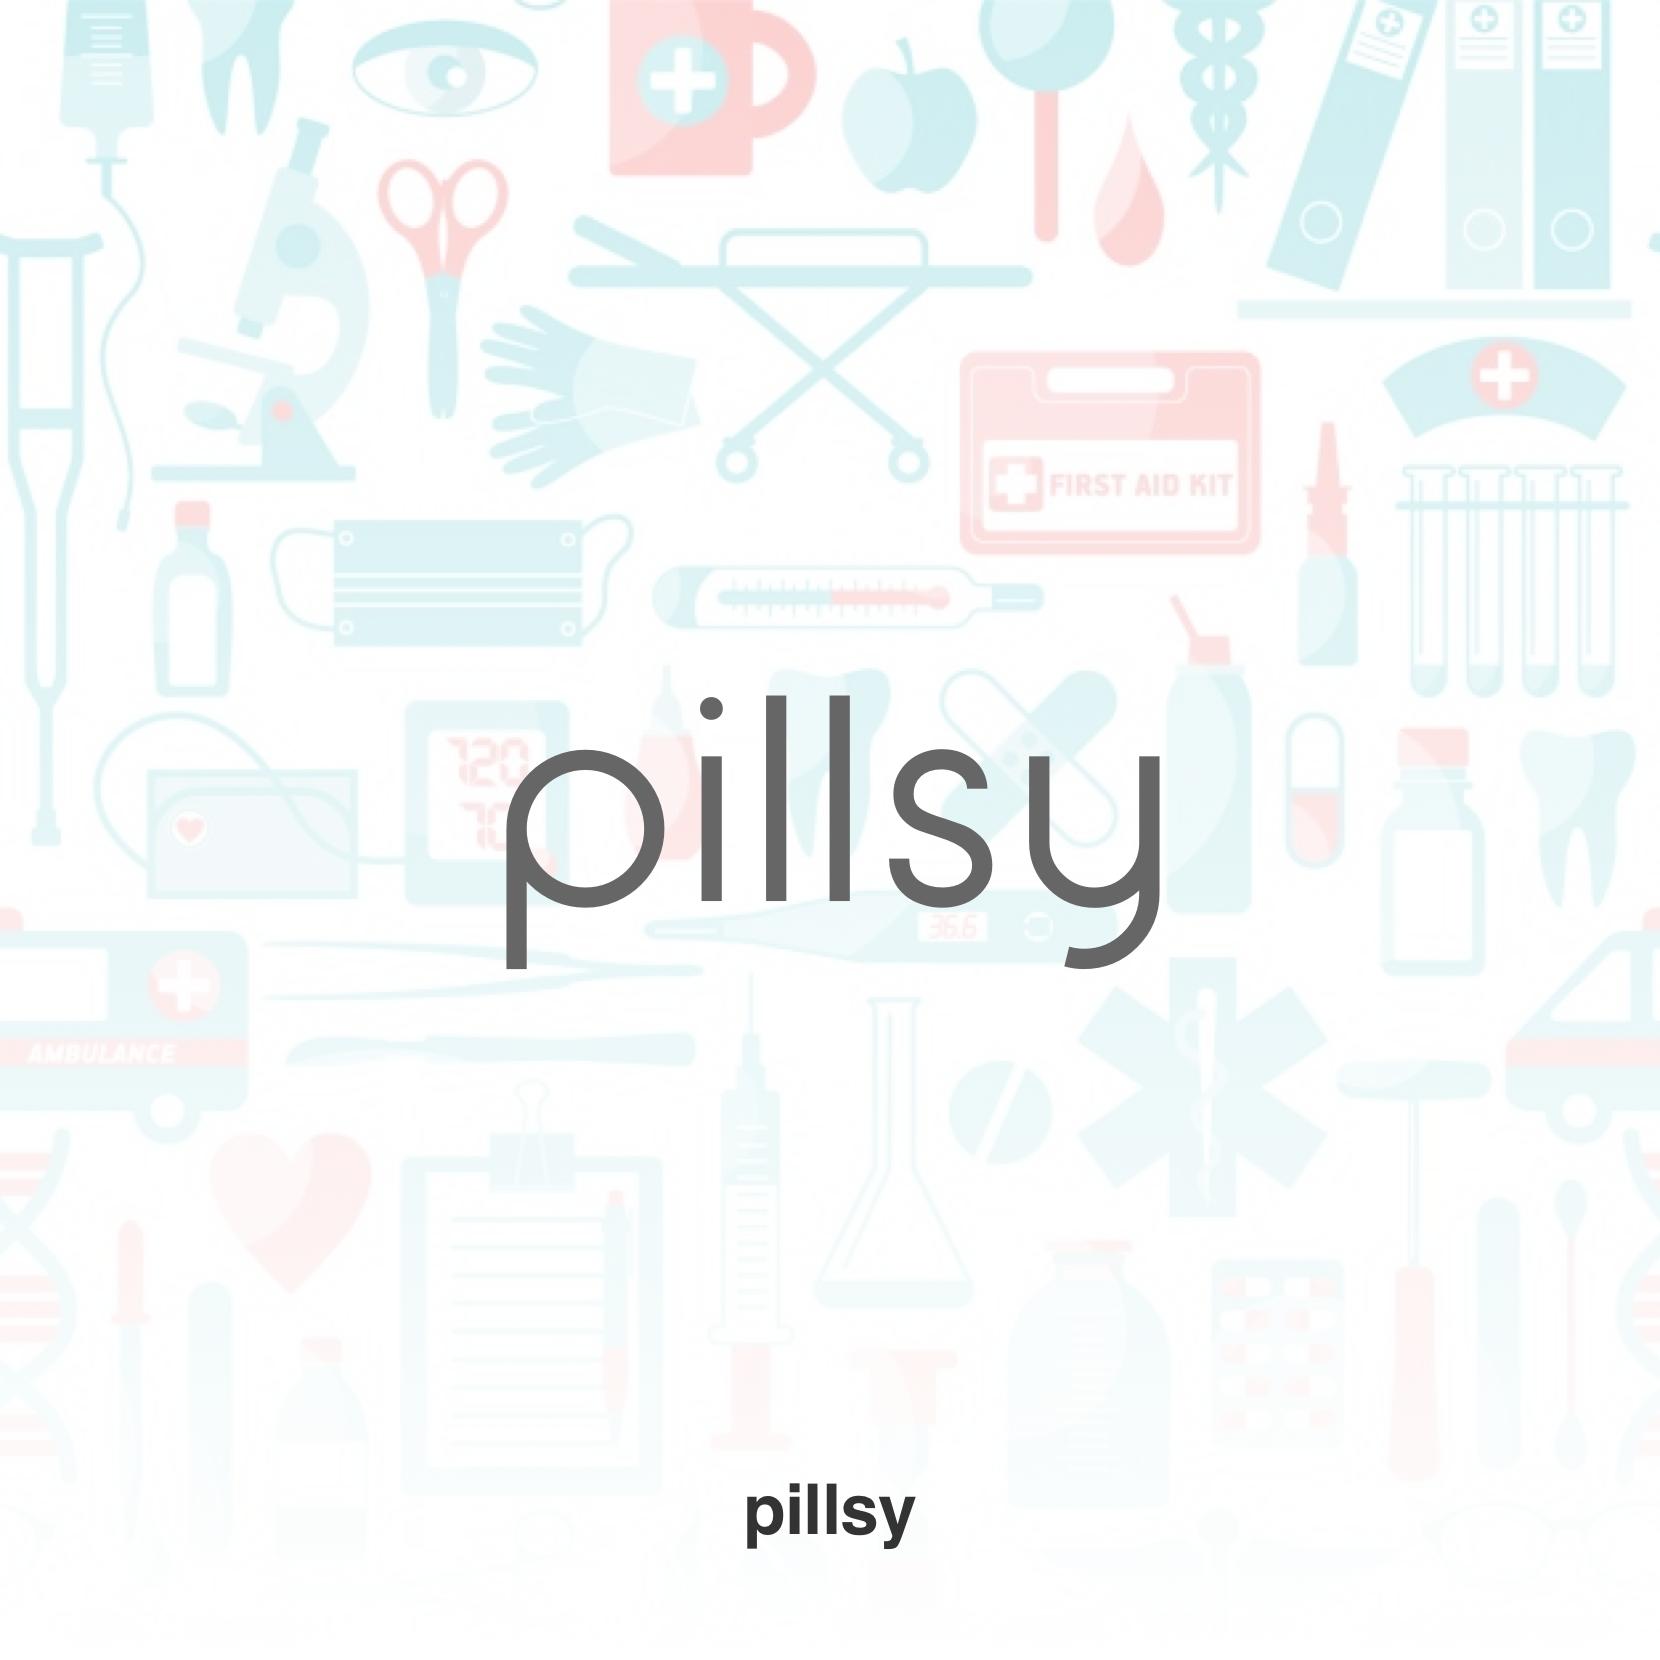 Pillsy